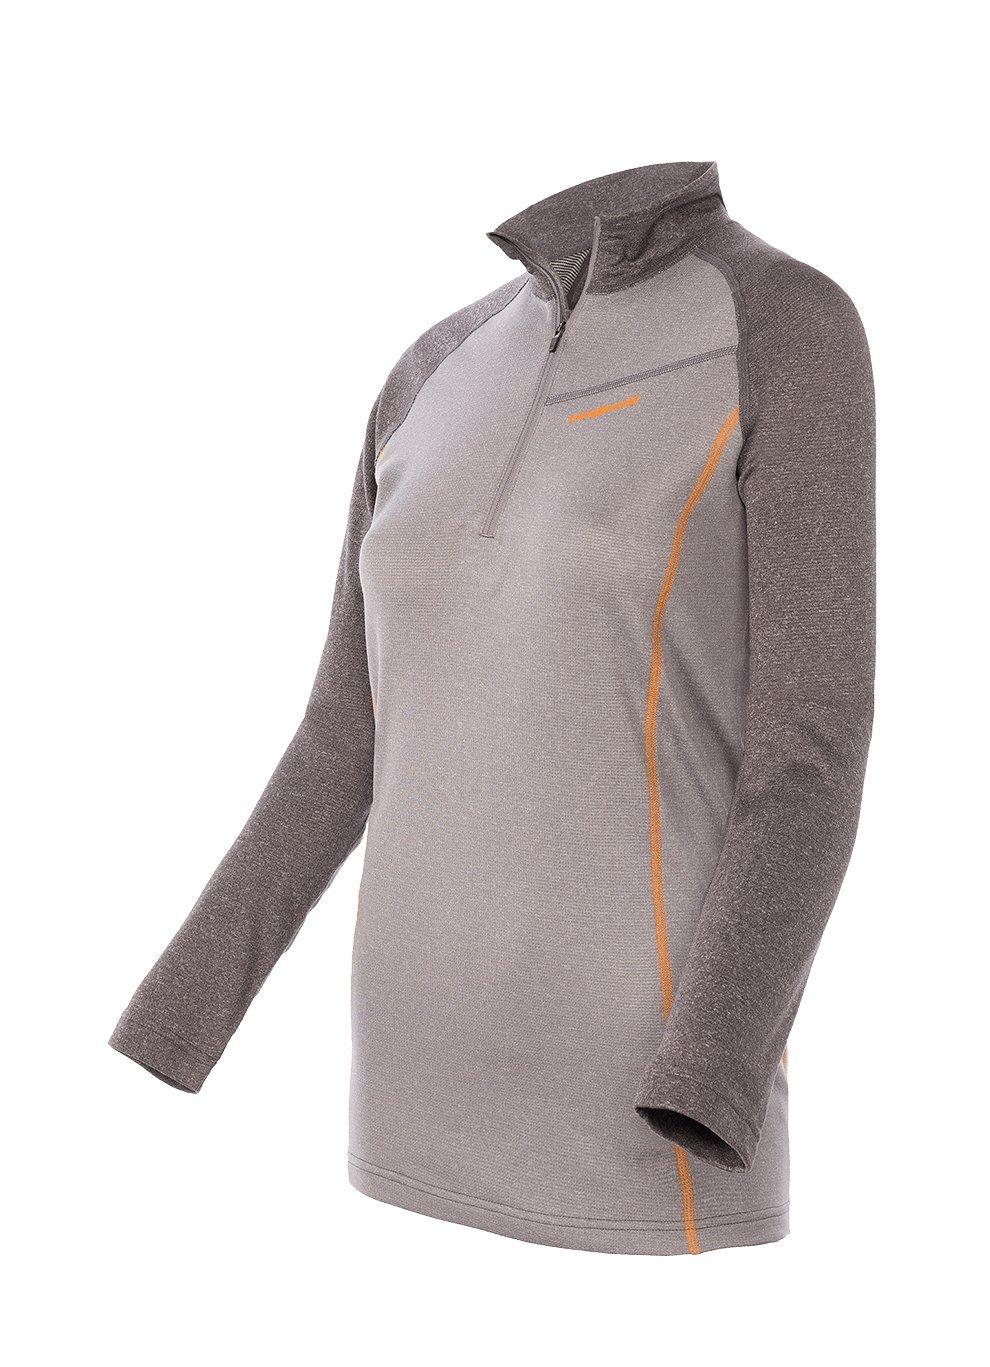 Trangoworld TRX2 Wool WM Pro Pullover Innenraum, Damen